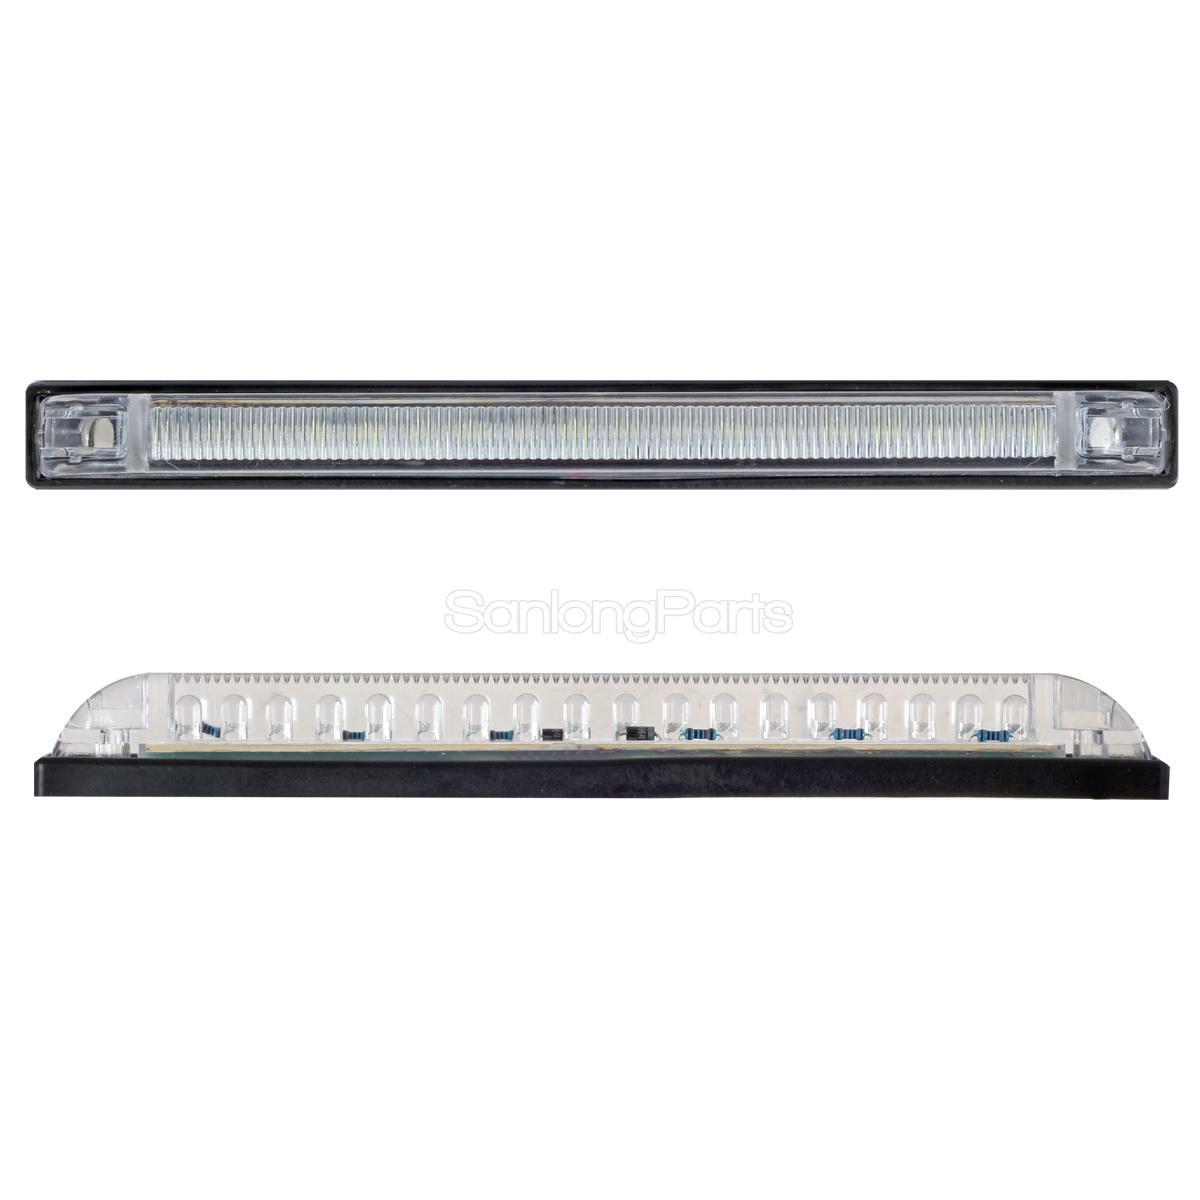 West Marine 12645065 LED Step Light Boat White Low Amp Draw 51696